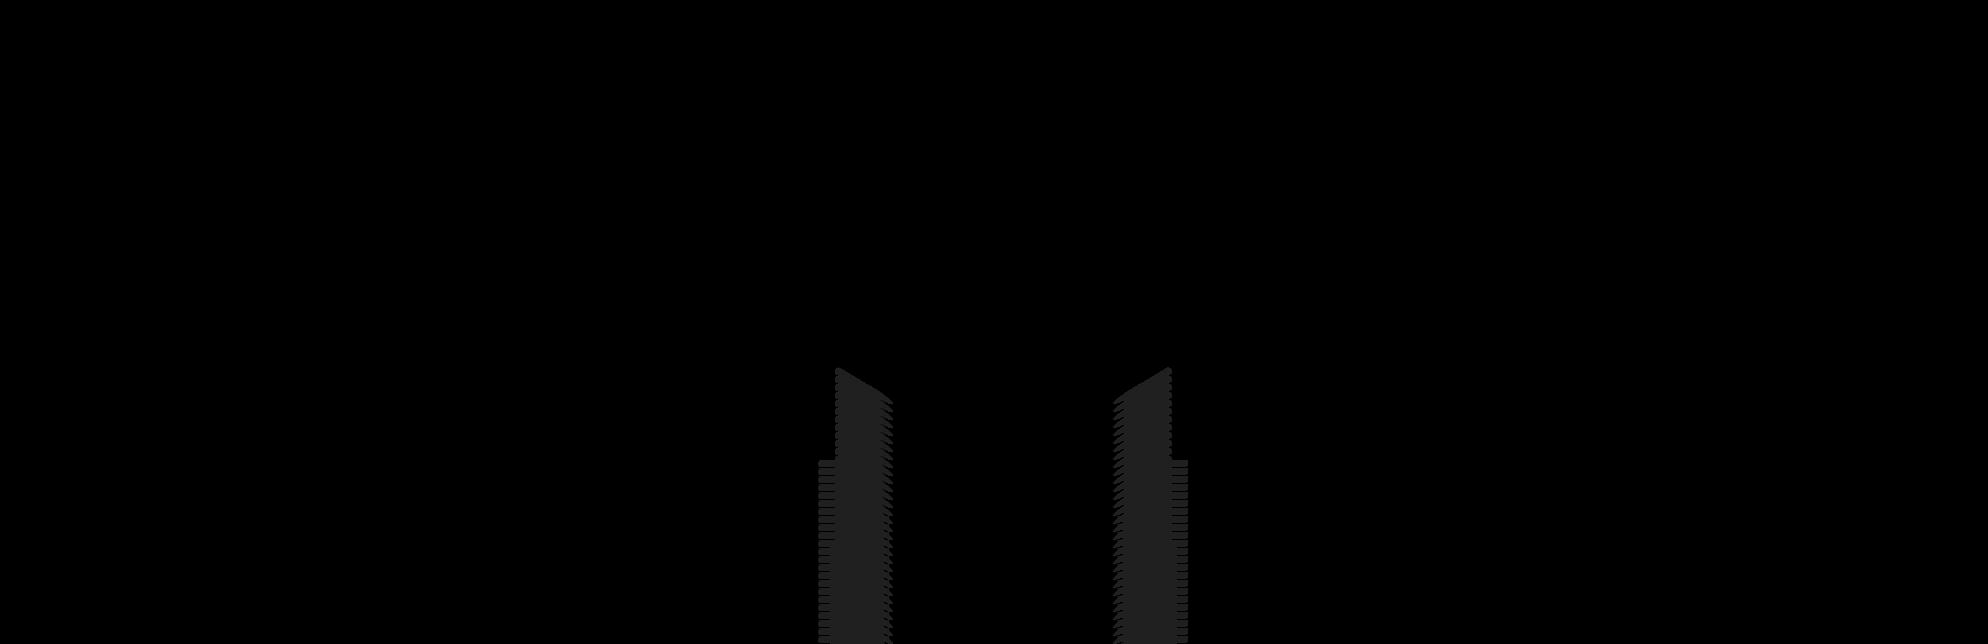 Hyperbole - image 1 - student project